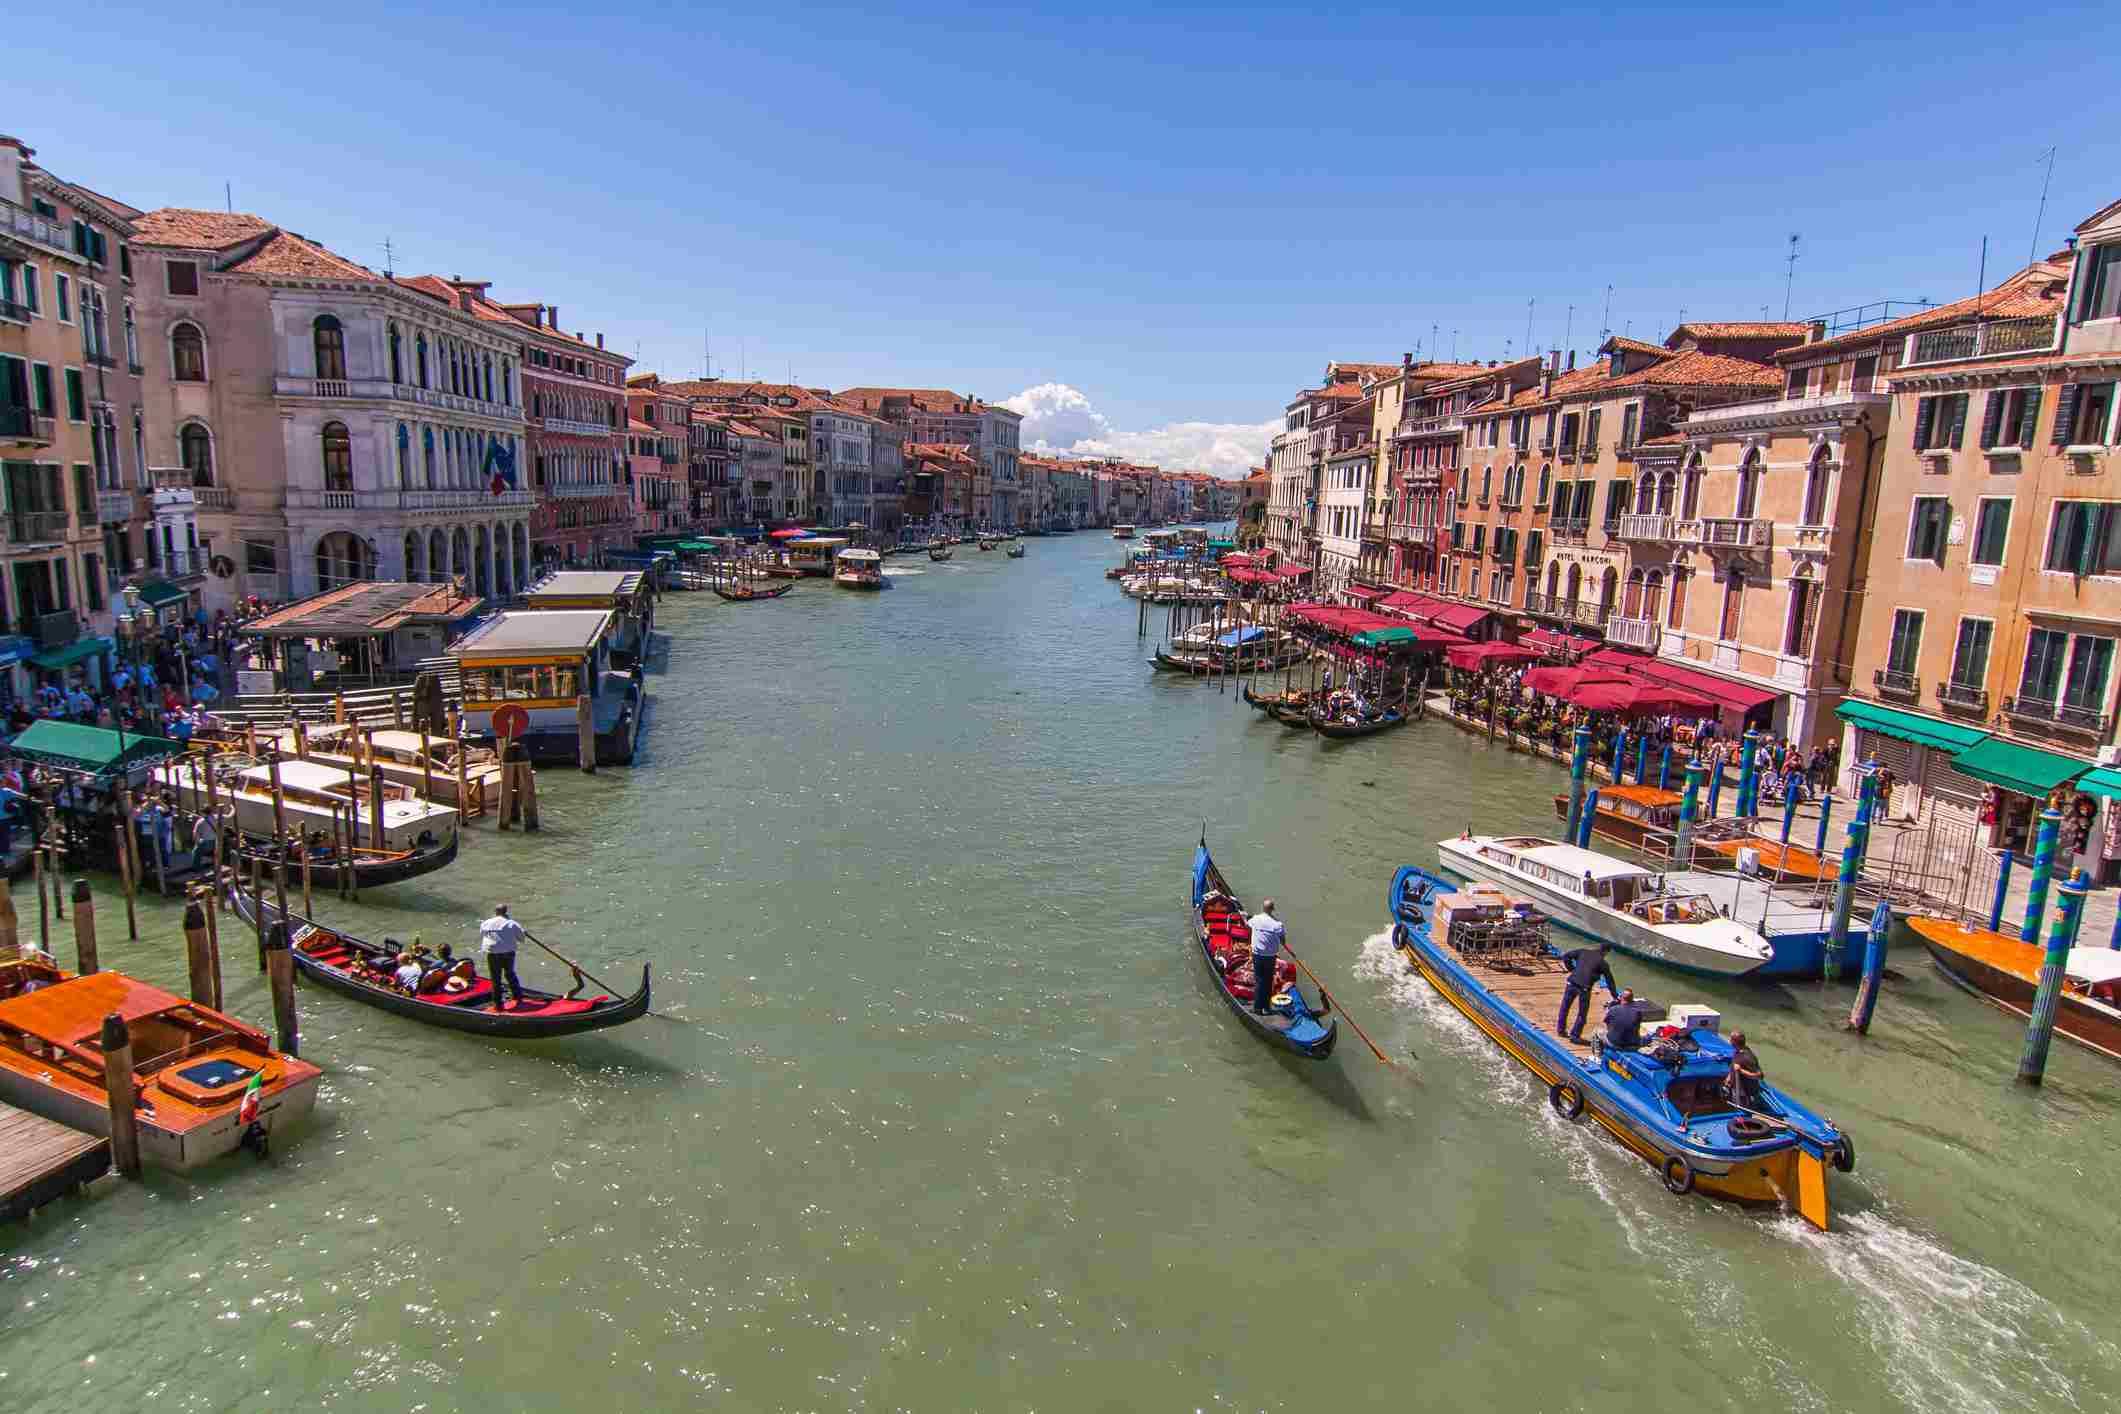 Grand Canal by Gondola